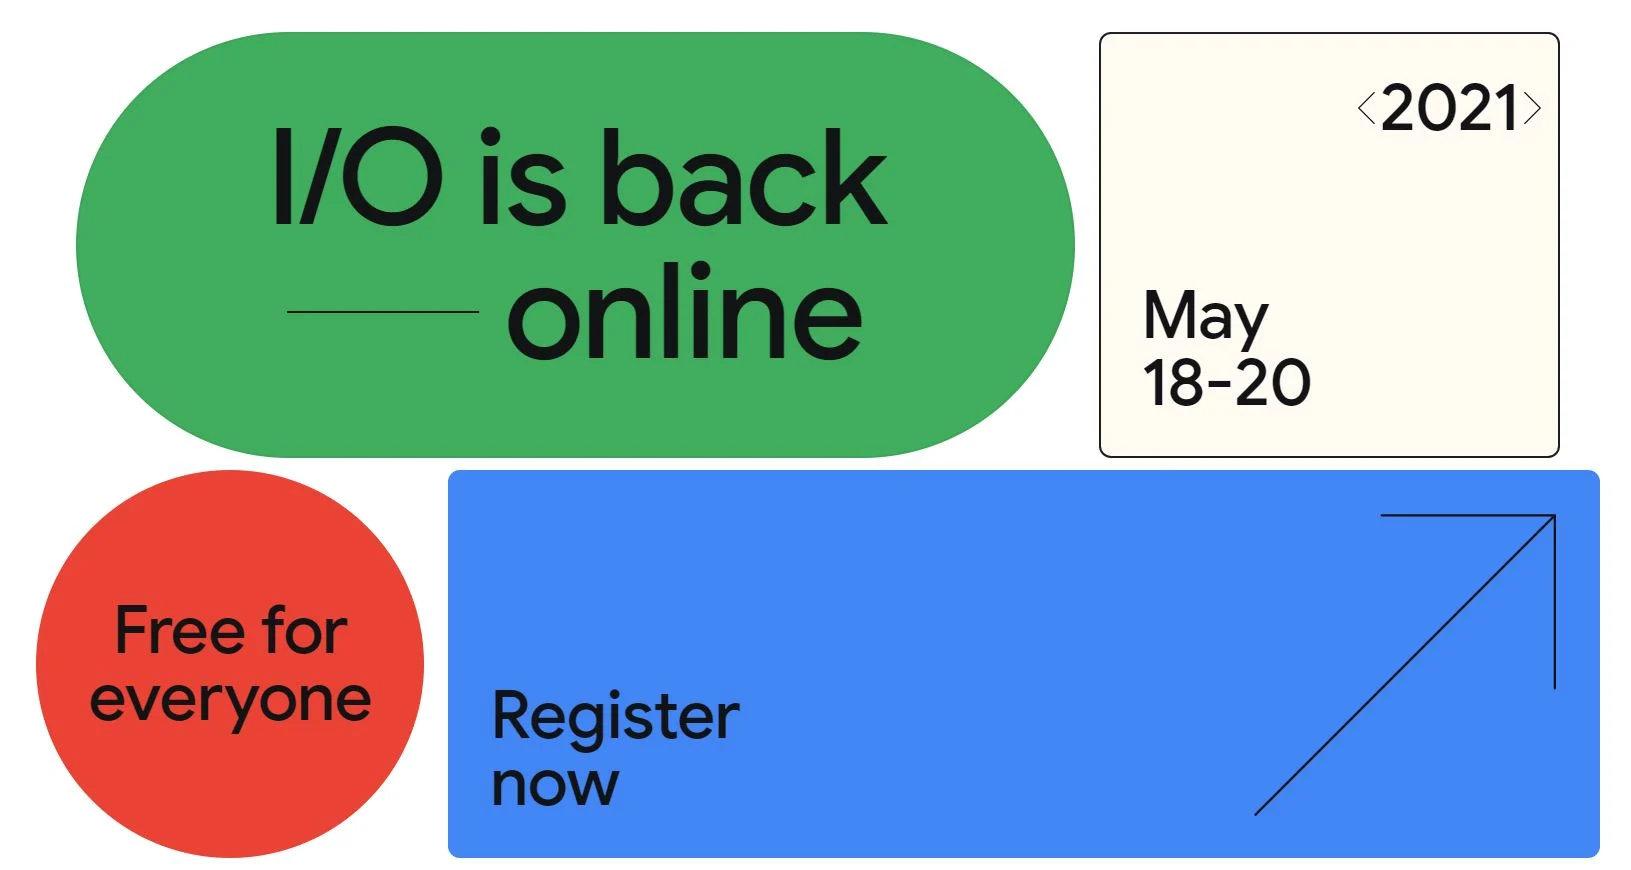 Google I/O 2021 将于 5 月 18 日至 20 日举行